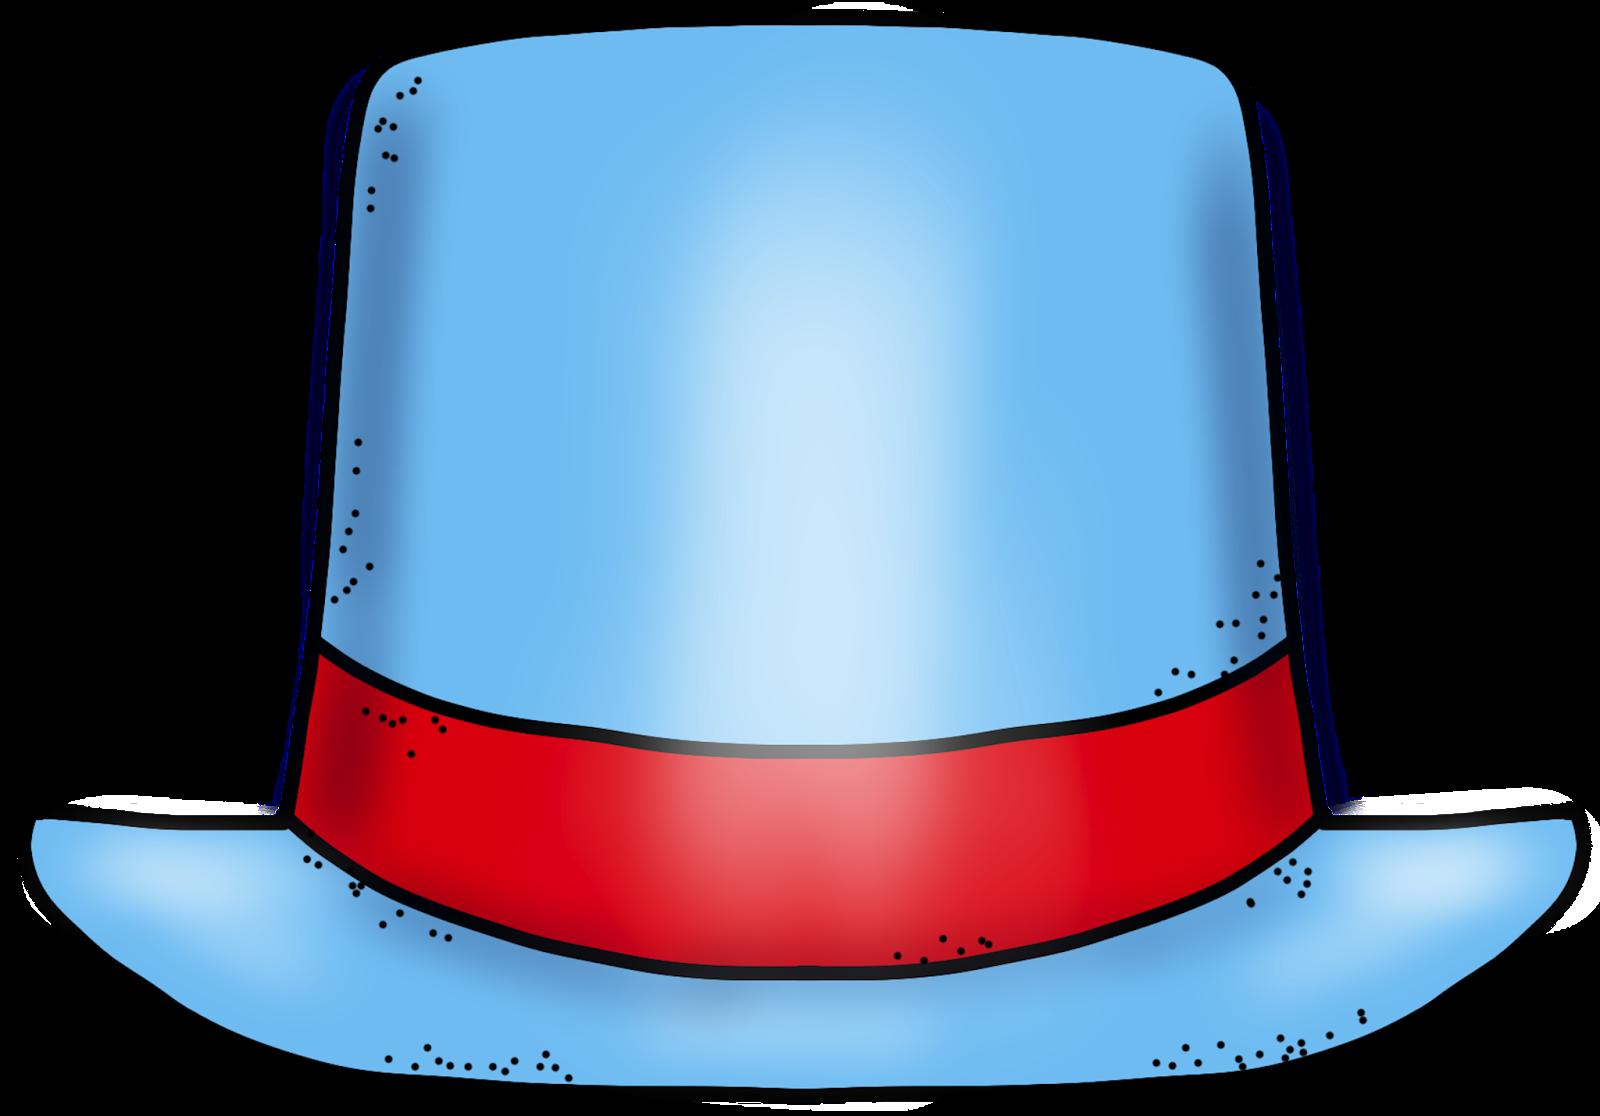 Clipart baseball hat clipart image